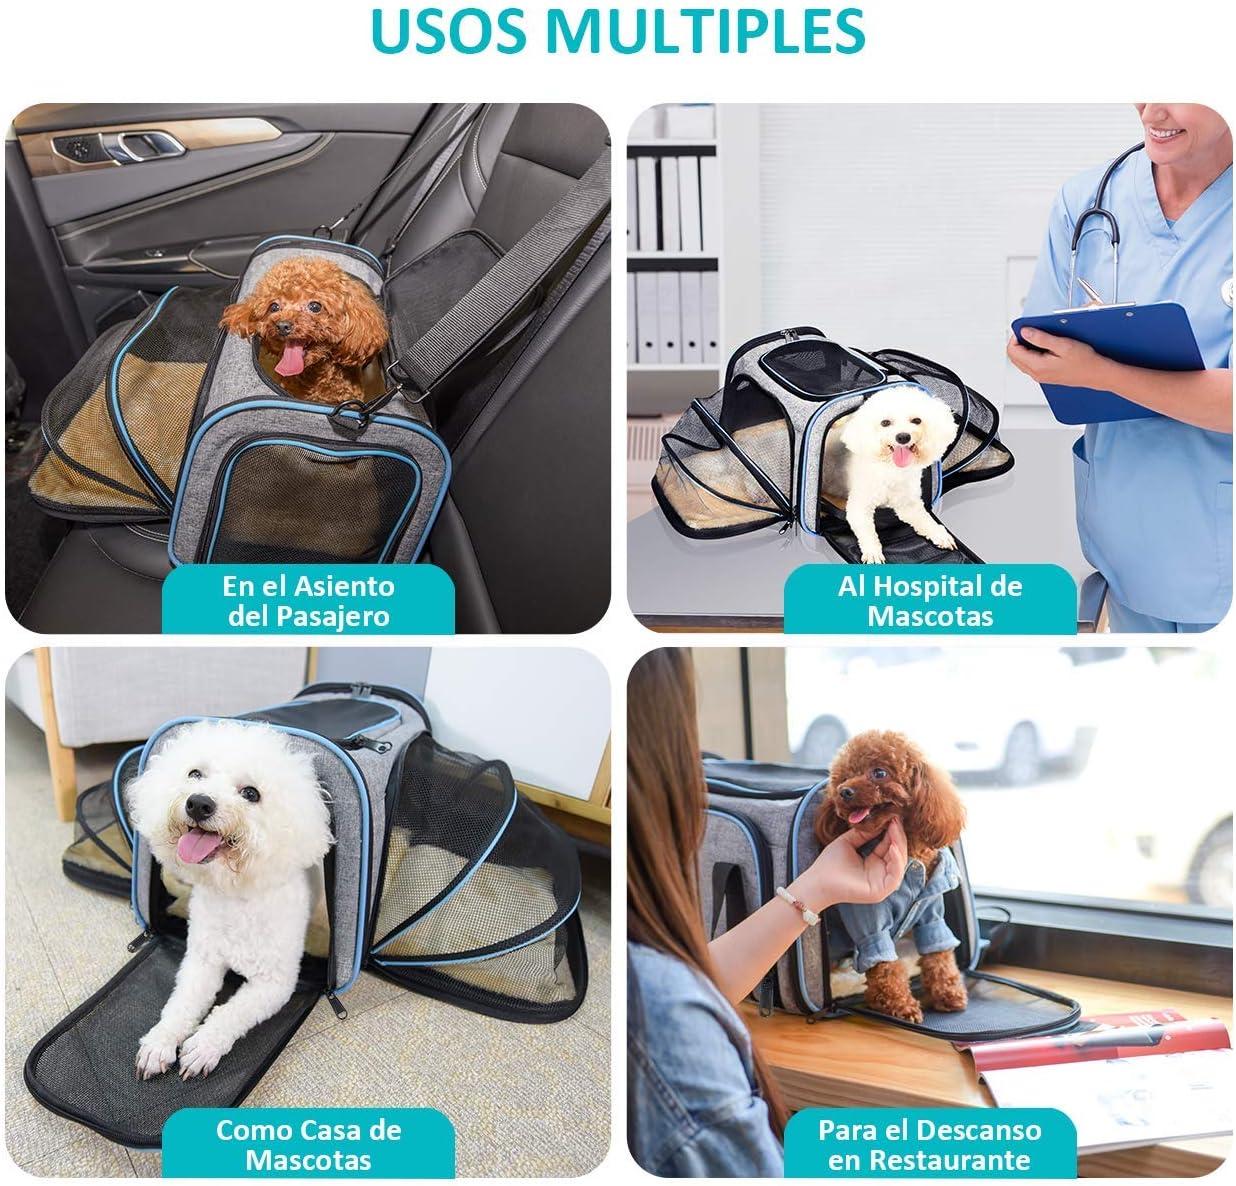 OMORC Transport/ín Plegable para Mascotas Aprobado por avi/ón Bolsa de Viaje para Gatos y Perros Bolso de Transporte para Mascotas Amplio y Plegable